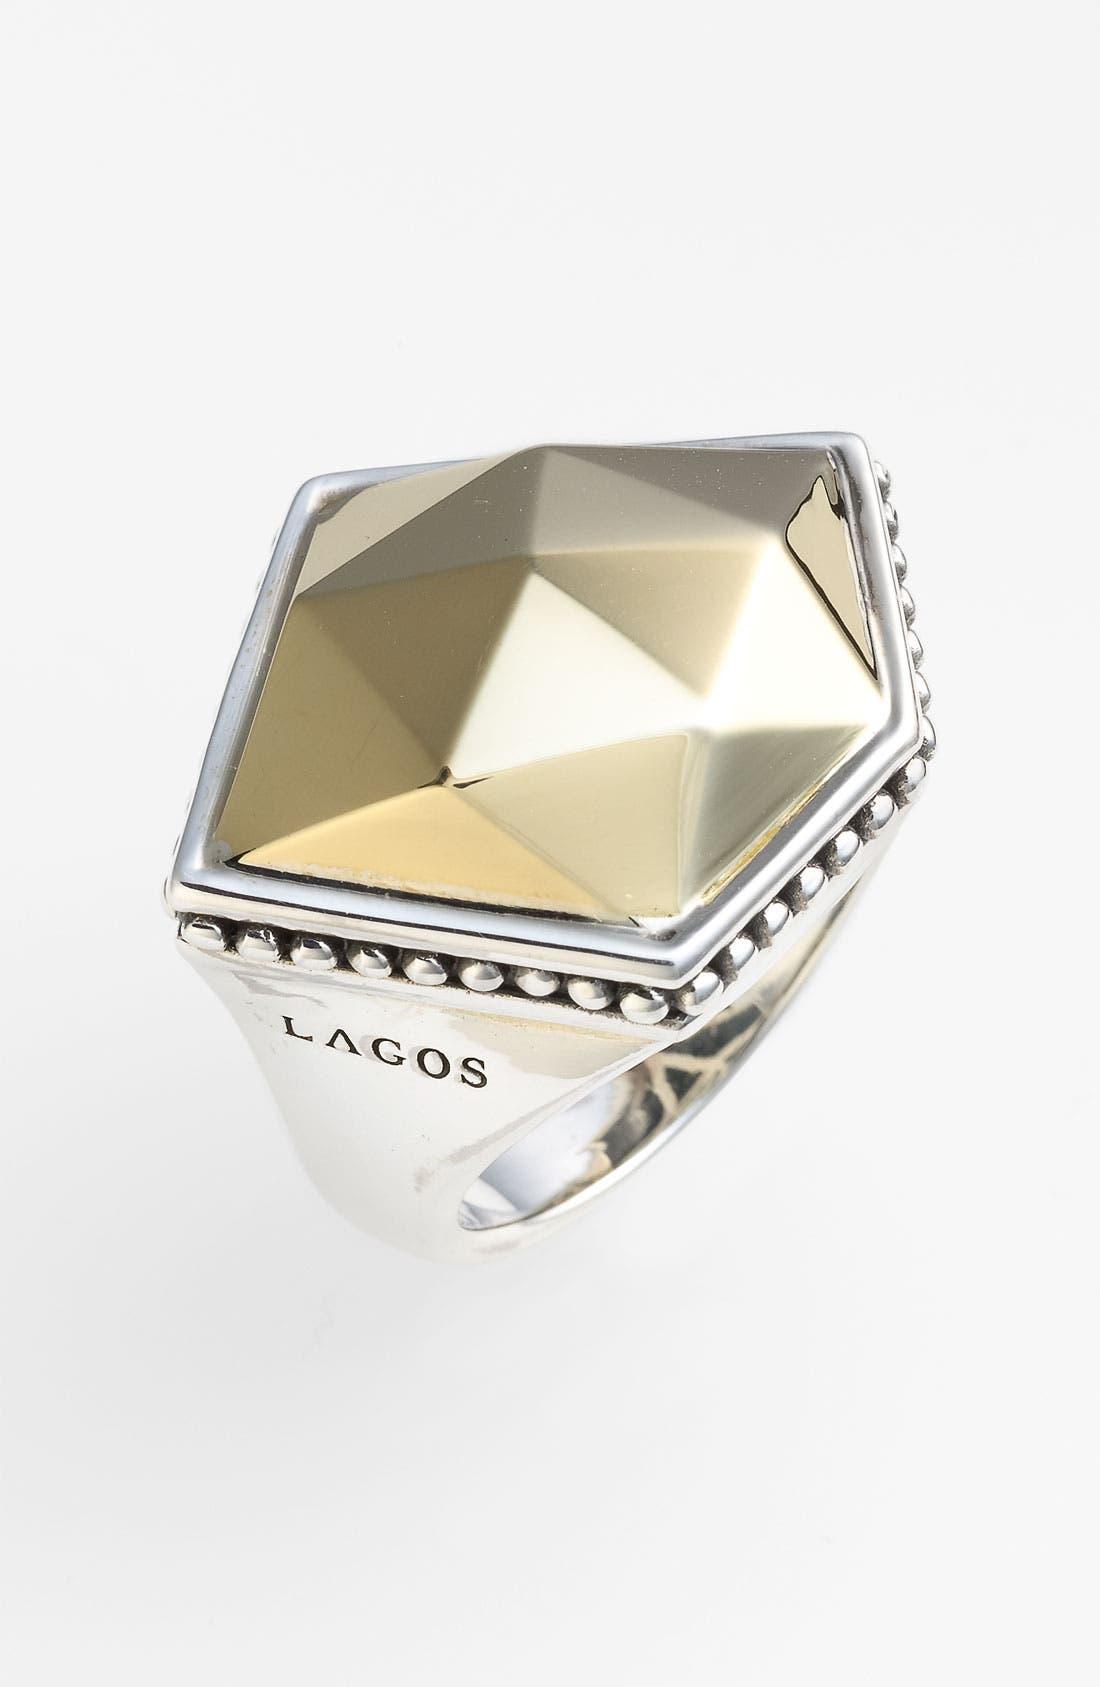 Main Image - LAGOS 'Rocks' Angled Two Tone Ring